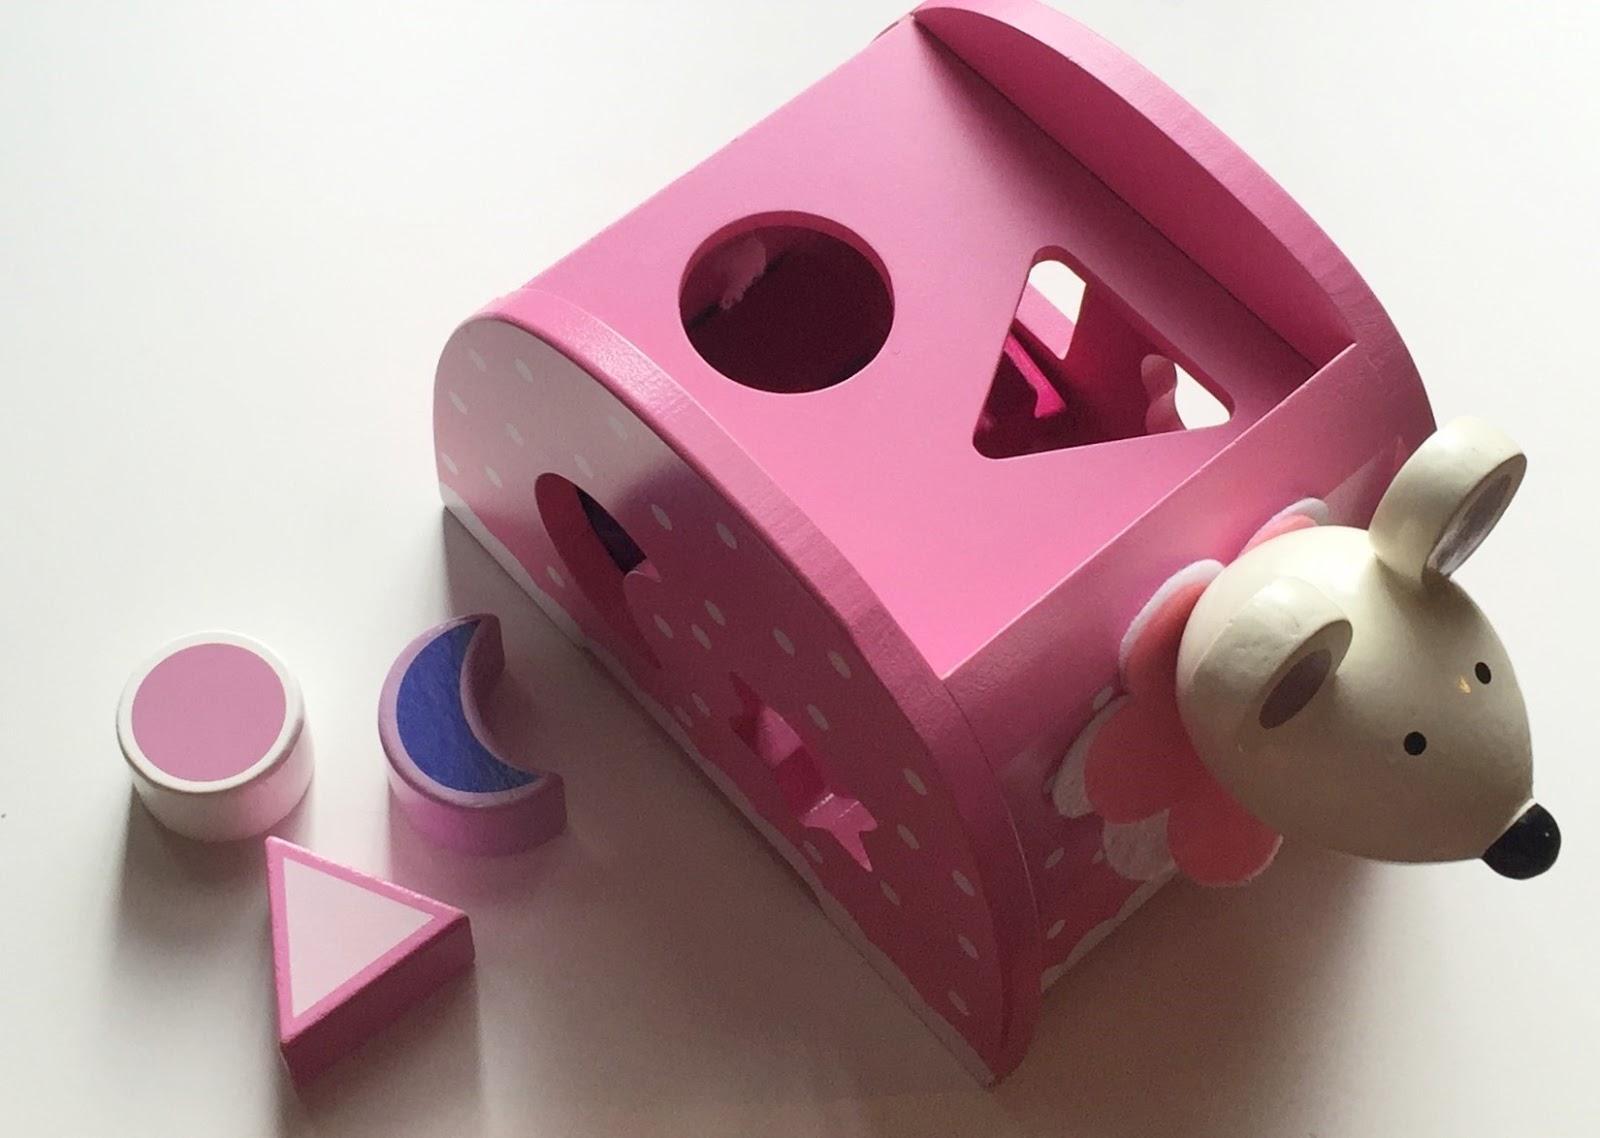 Asda play and learn shape sorter